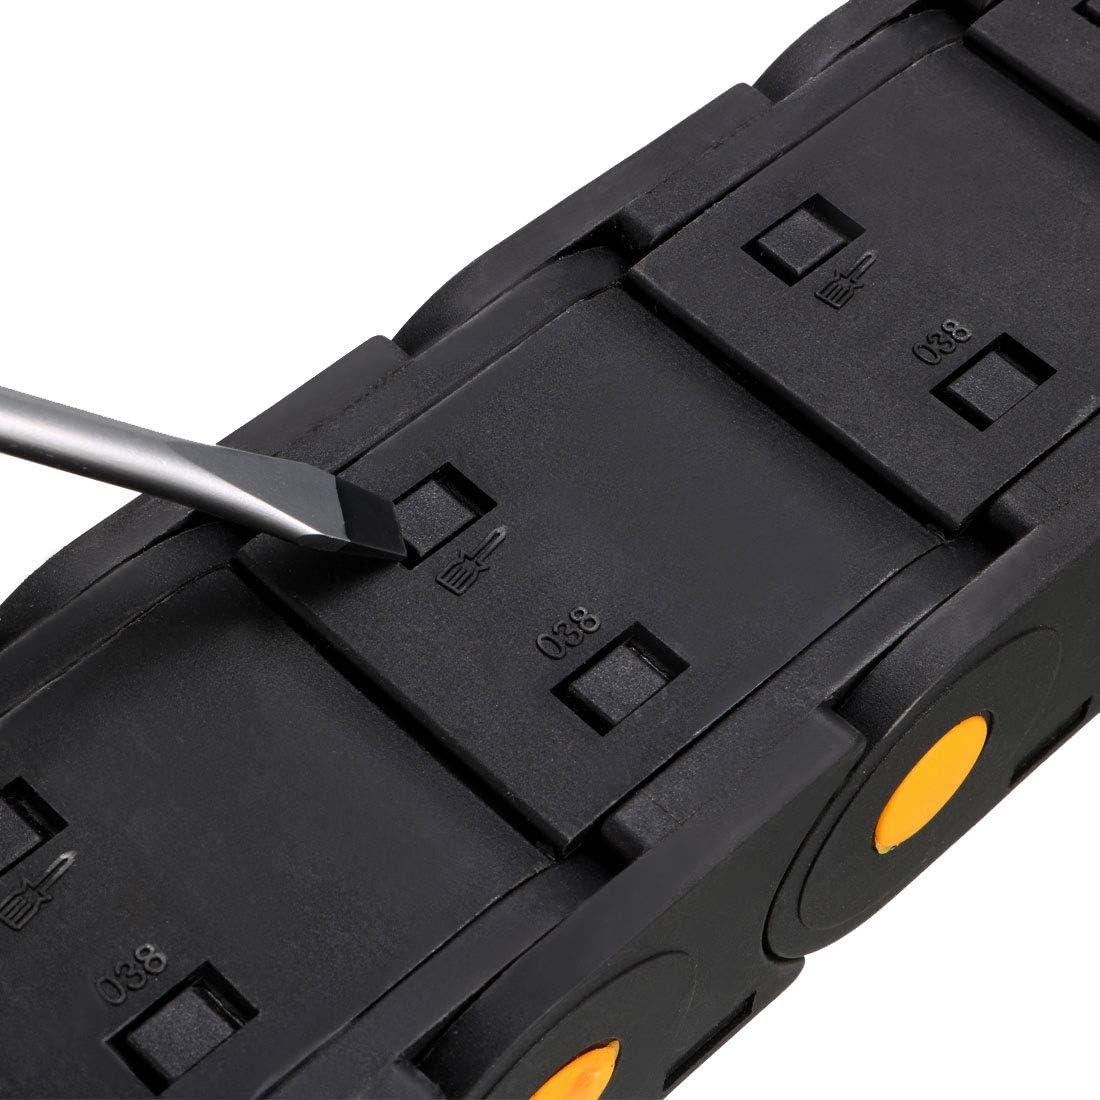 sourcingmap R55 25mm x103mm Schwarz Plastik Offenetyp Kabelschleppkette Drahttr/äger 1M L/änge DE de